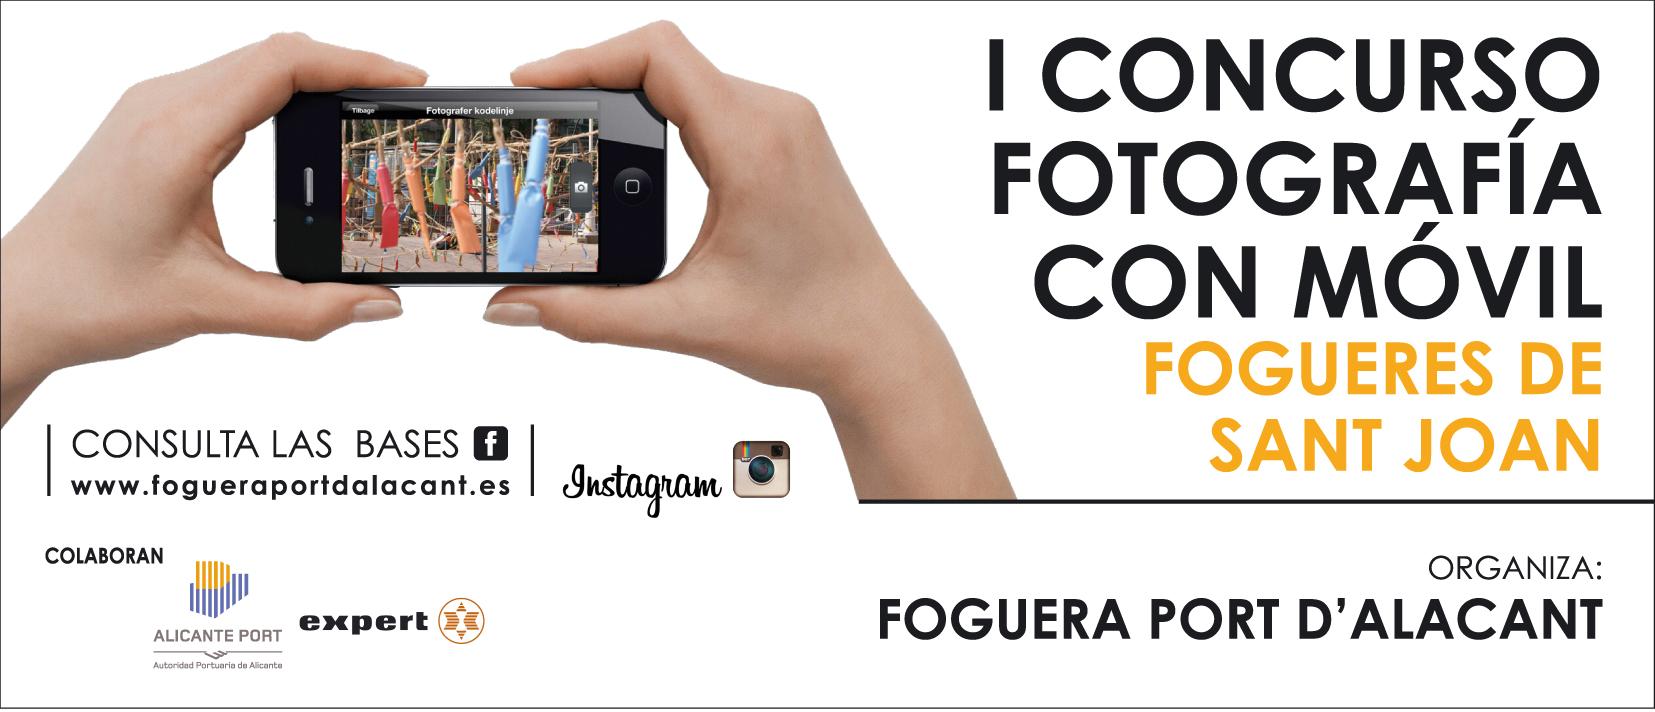 I Concurso de fotografía con móvil Fogueres de Sant Joan 2014